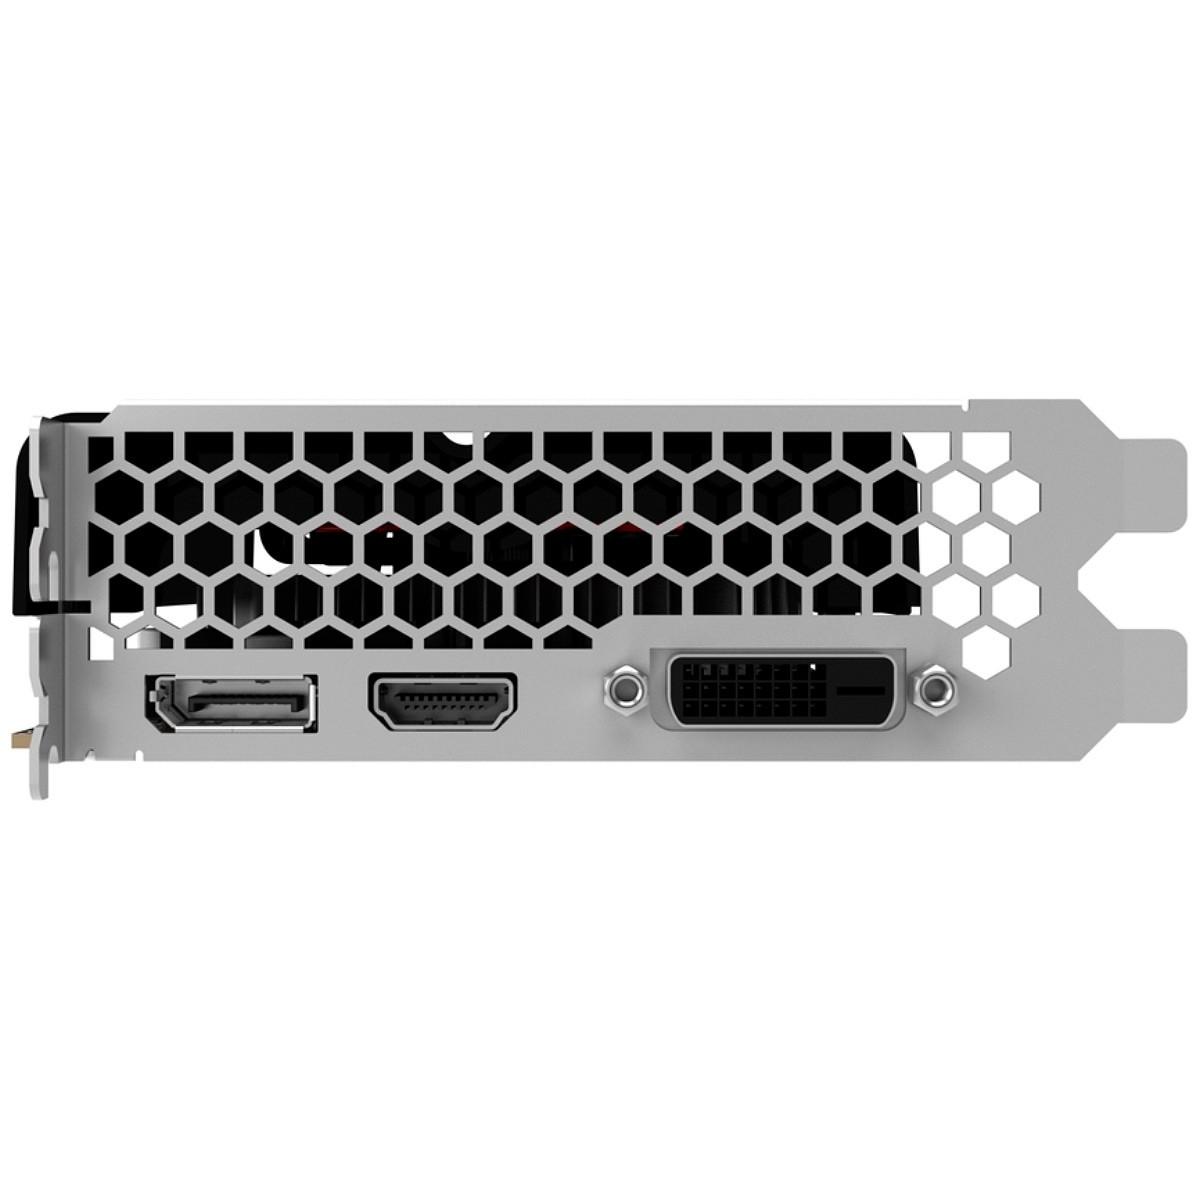 Placa de Vídeo GeForce GTX 1050 Ti 4GB GDDR5 128bits, Gainward - NE5105T018G1-1070F